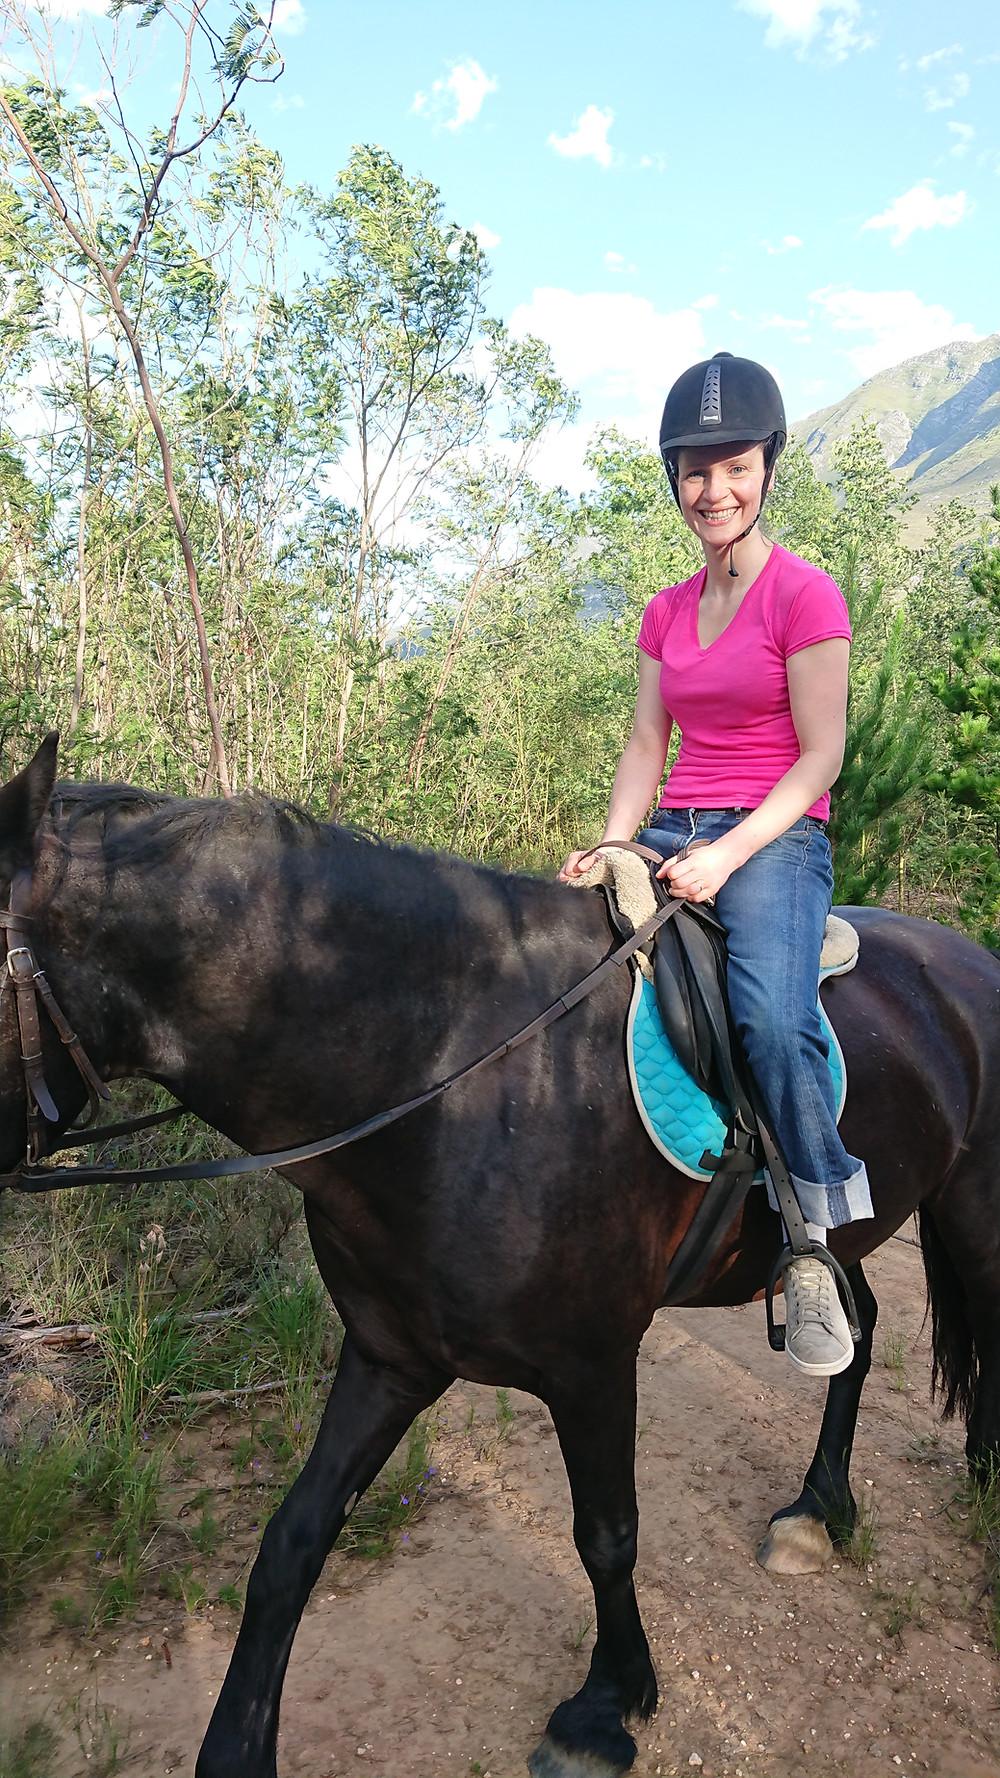 Ali horse-riding in Swellendam